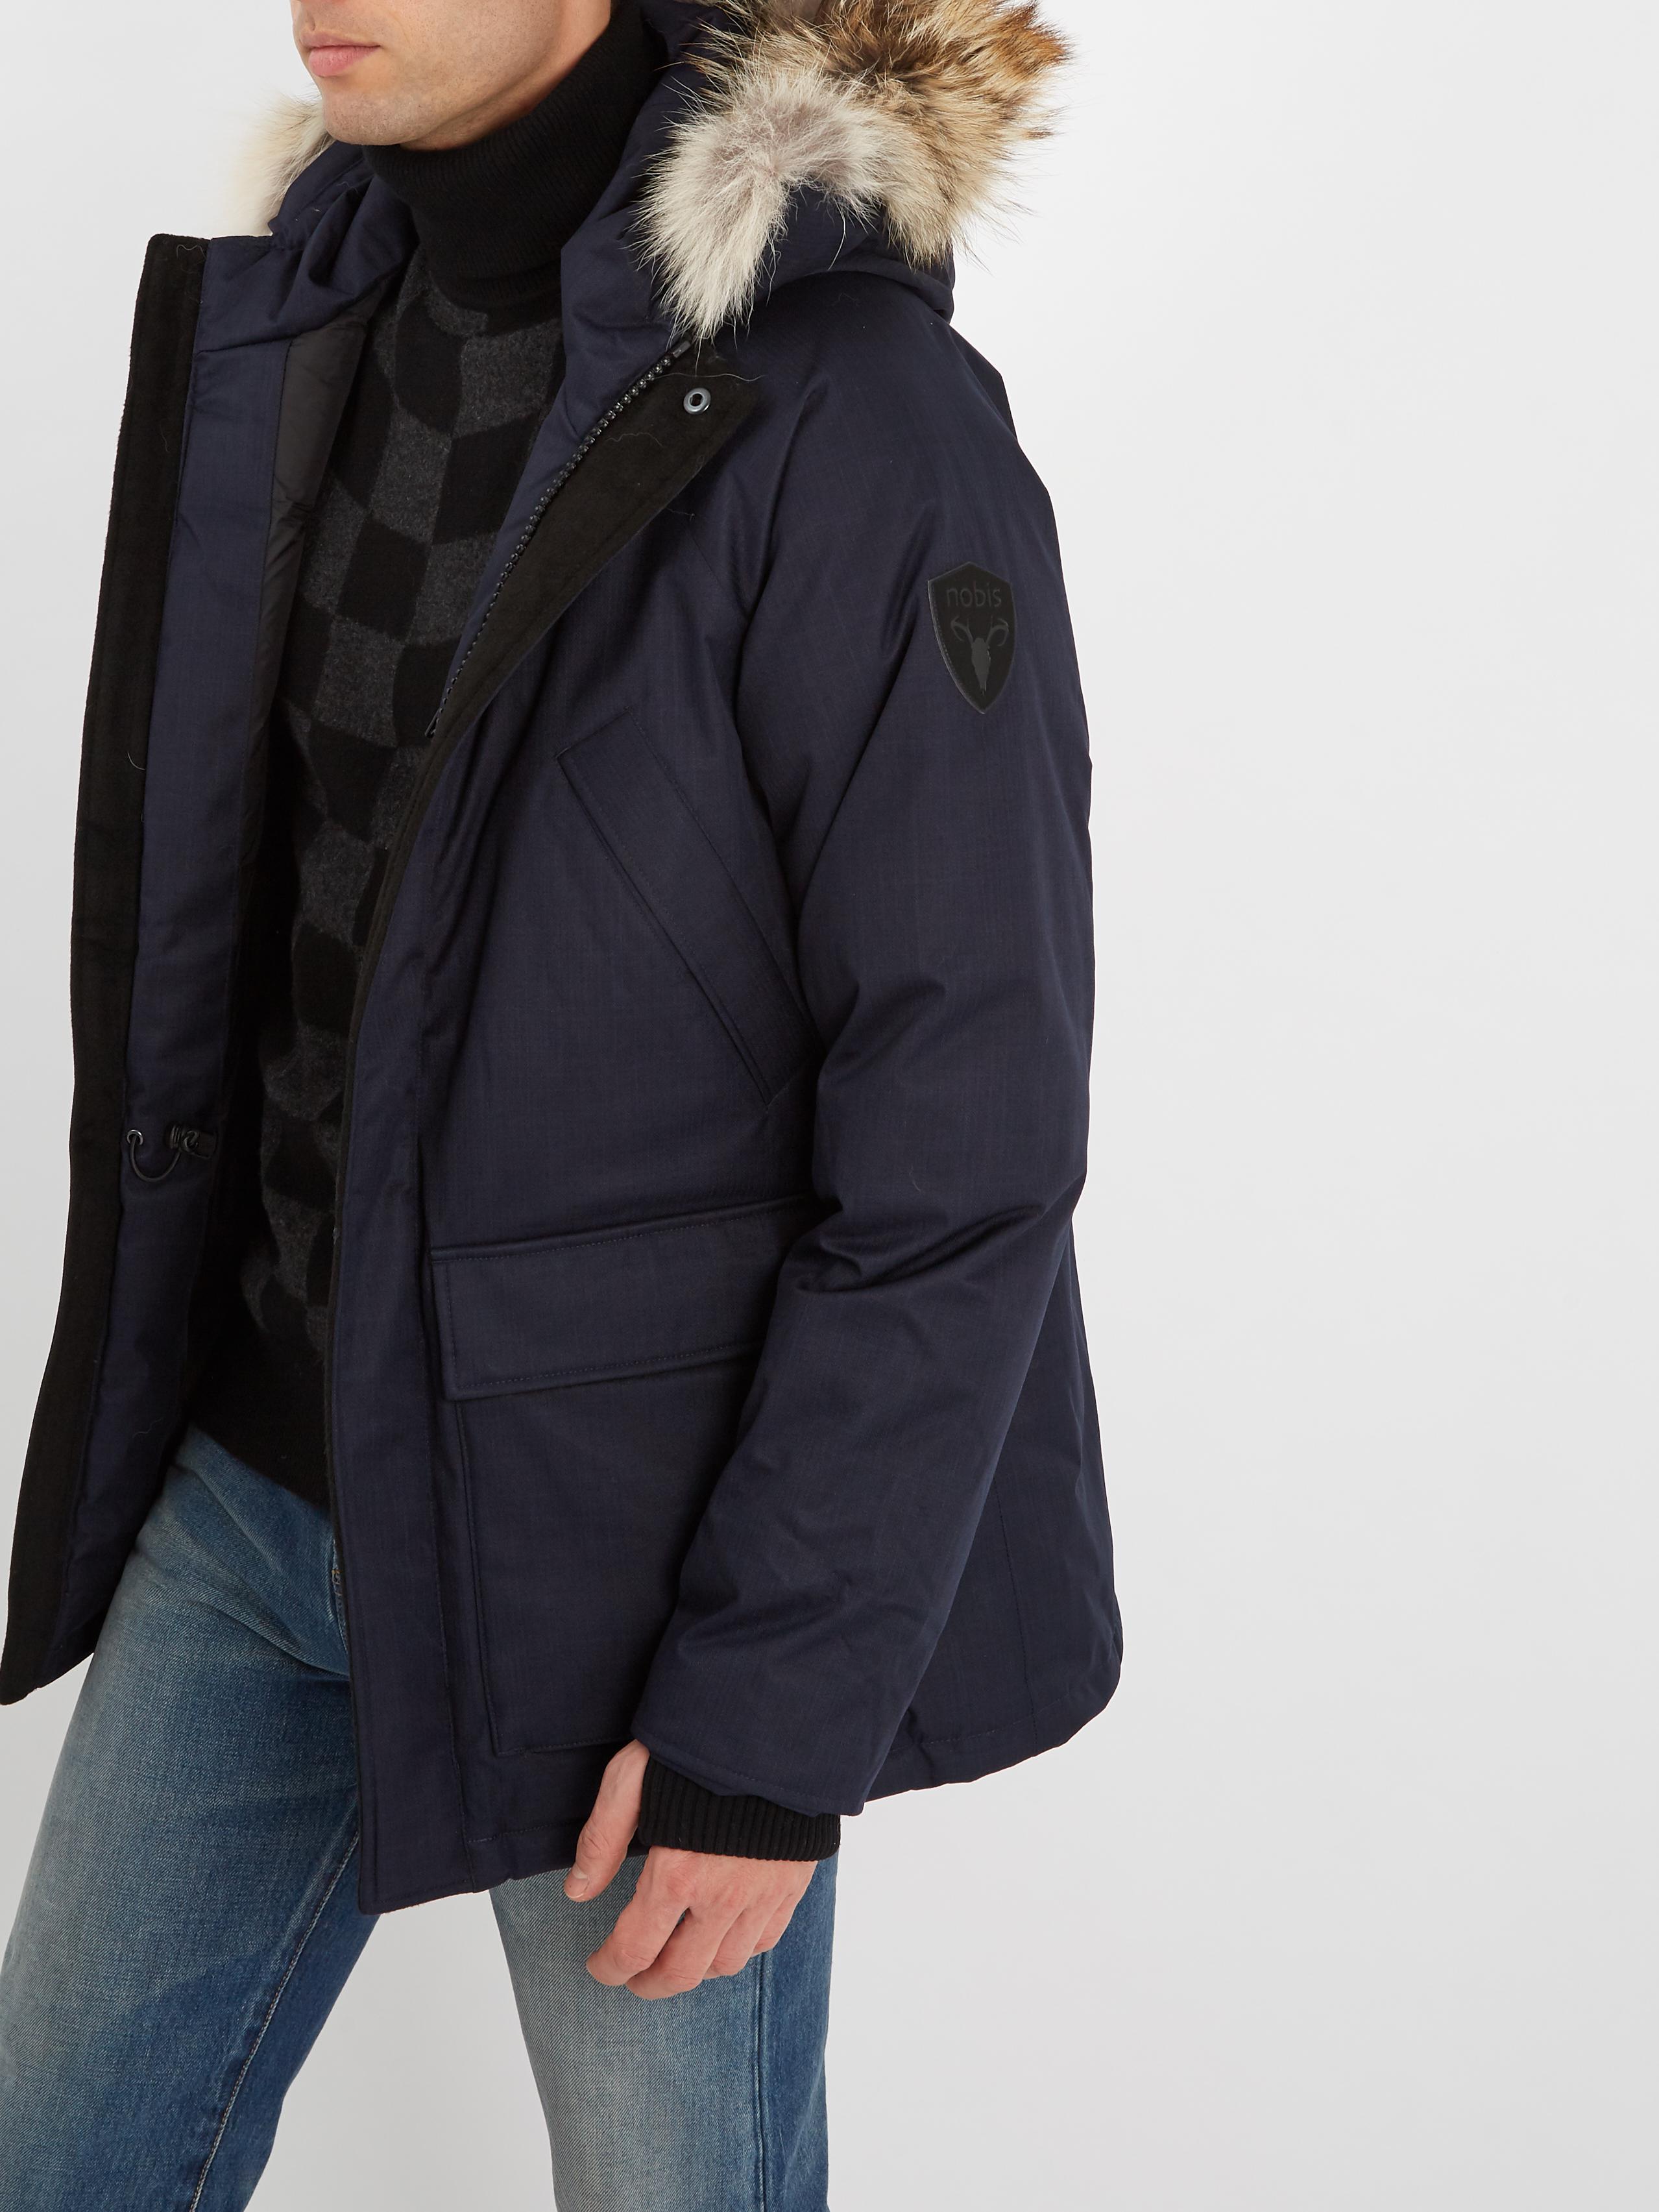 6c70b73c859 ebay nobis coat nike tech 3fda9 1af68